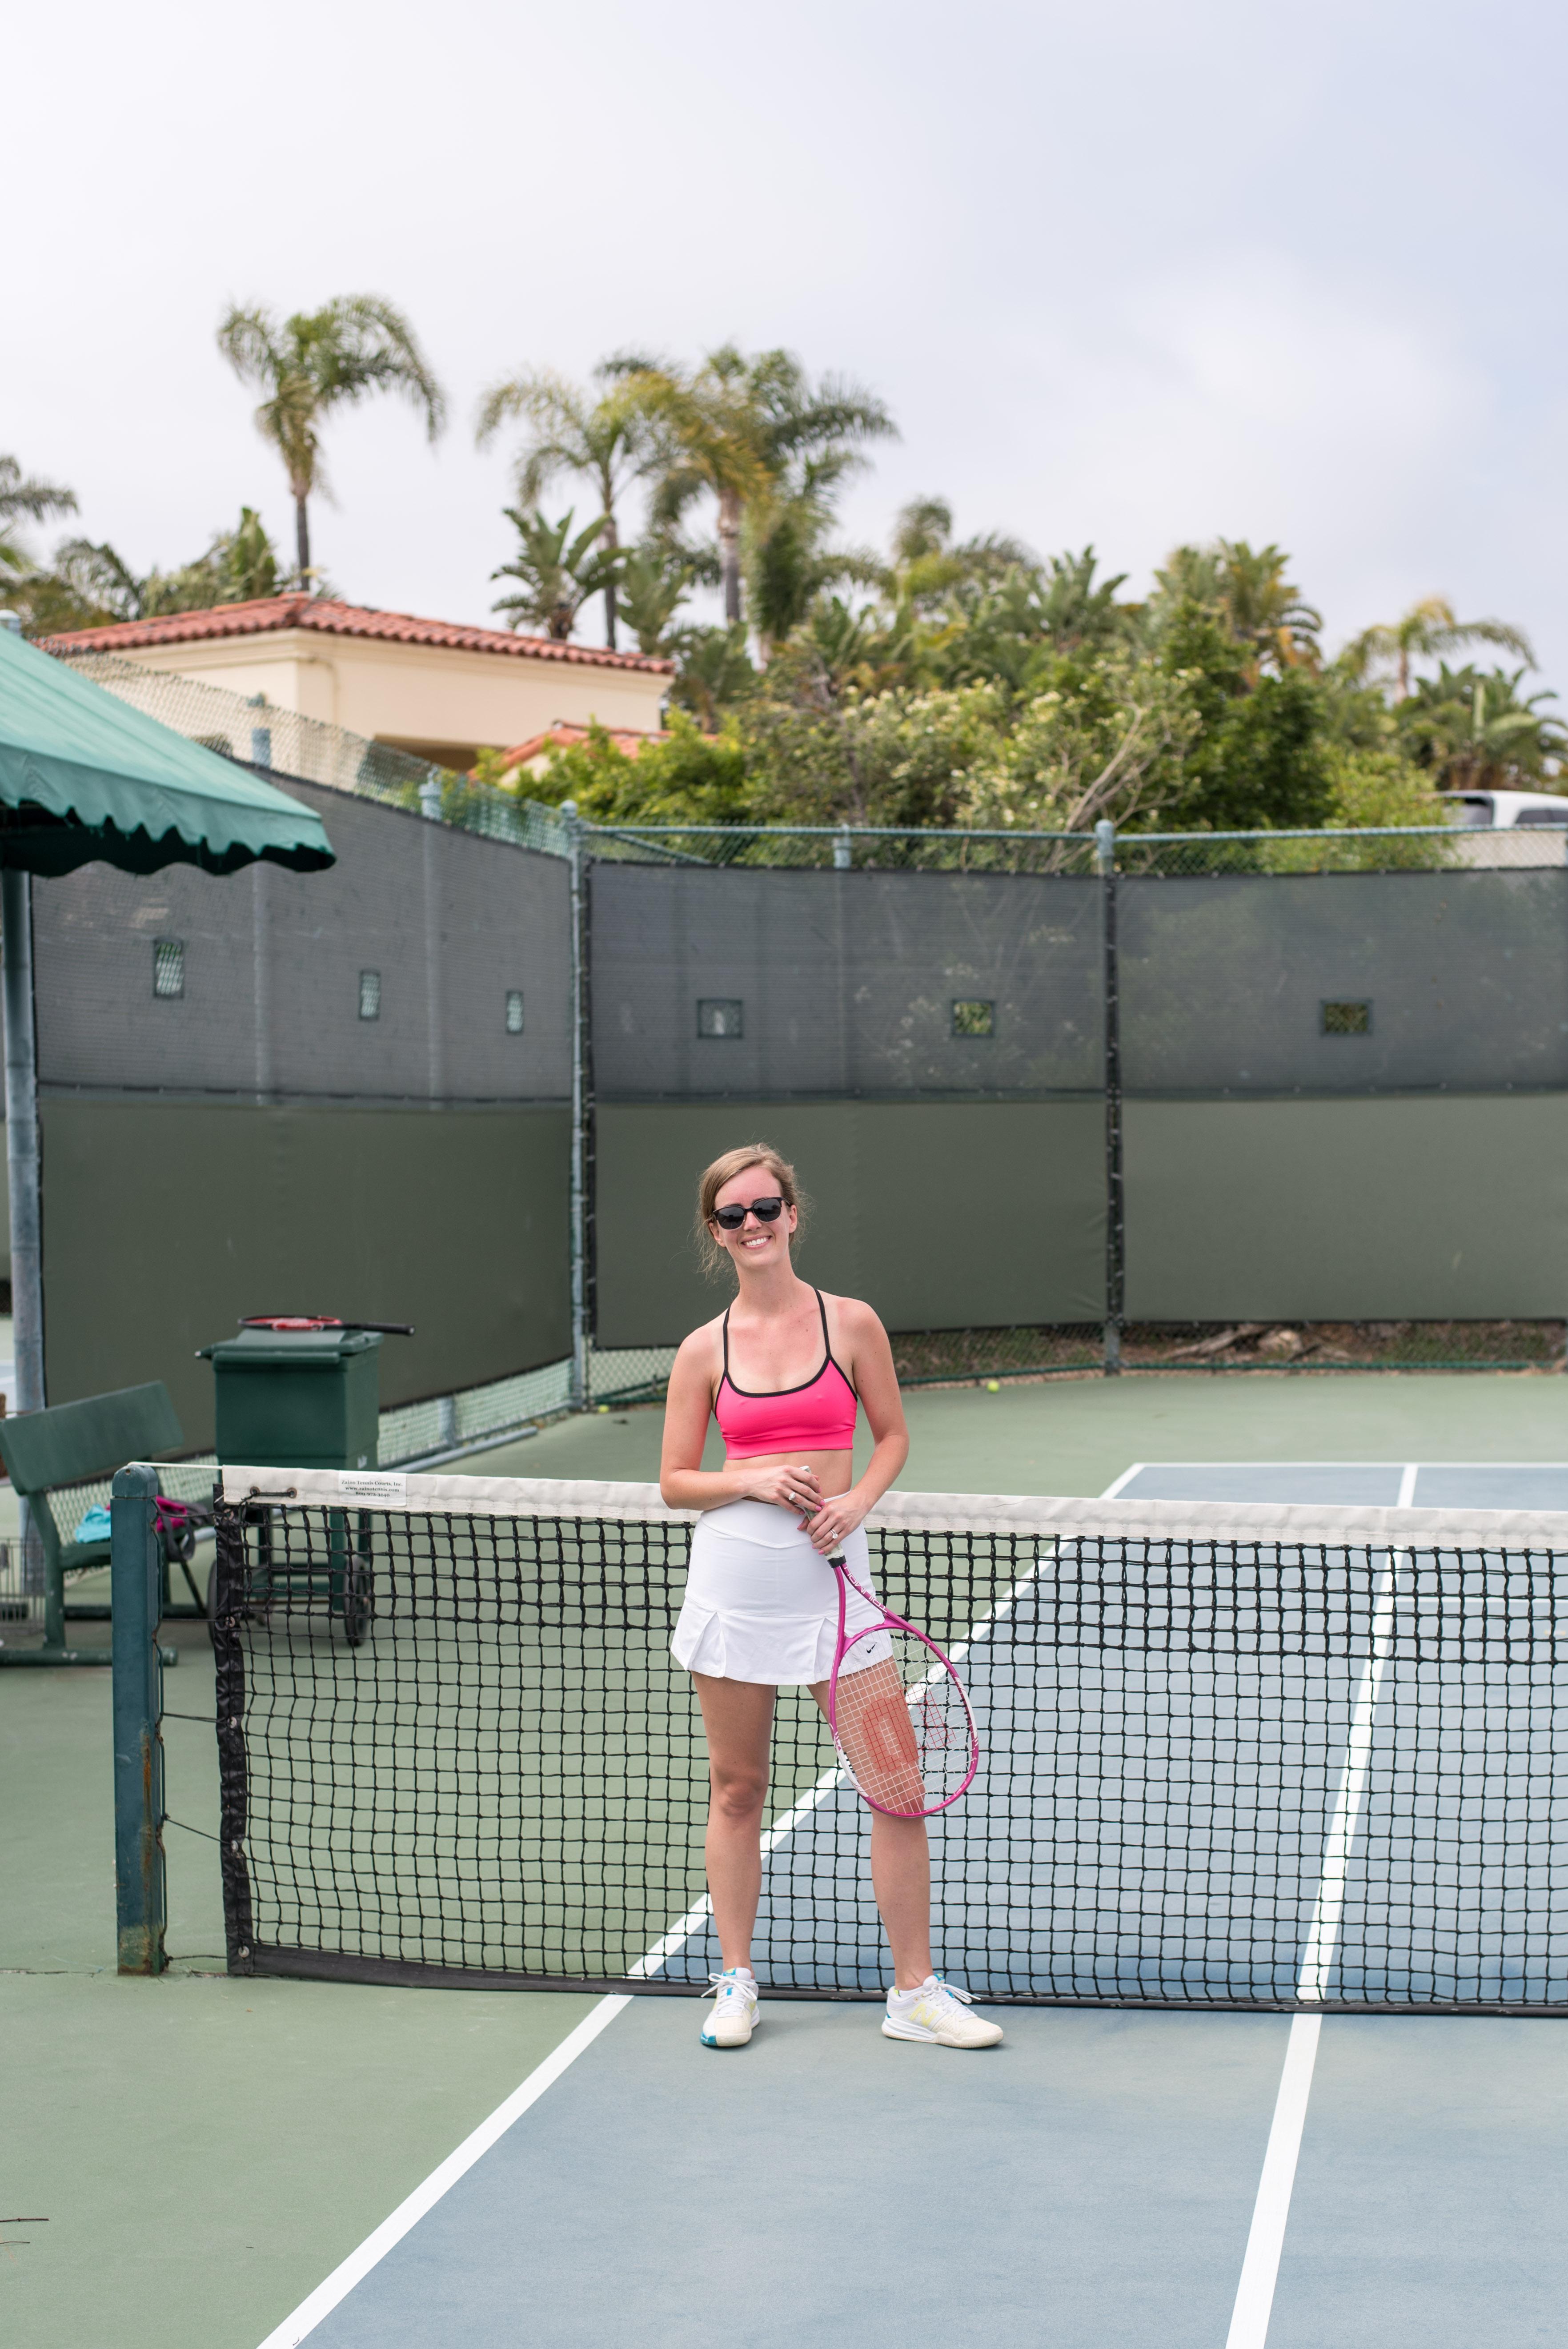 Ritz-Carlton Laguna Niguel Tennis